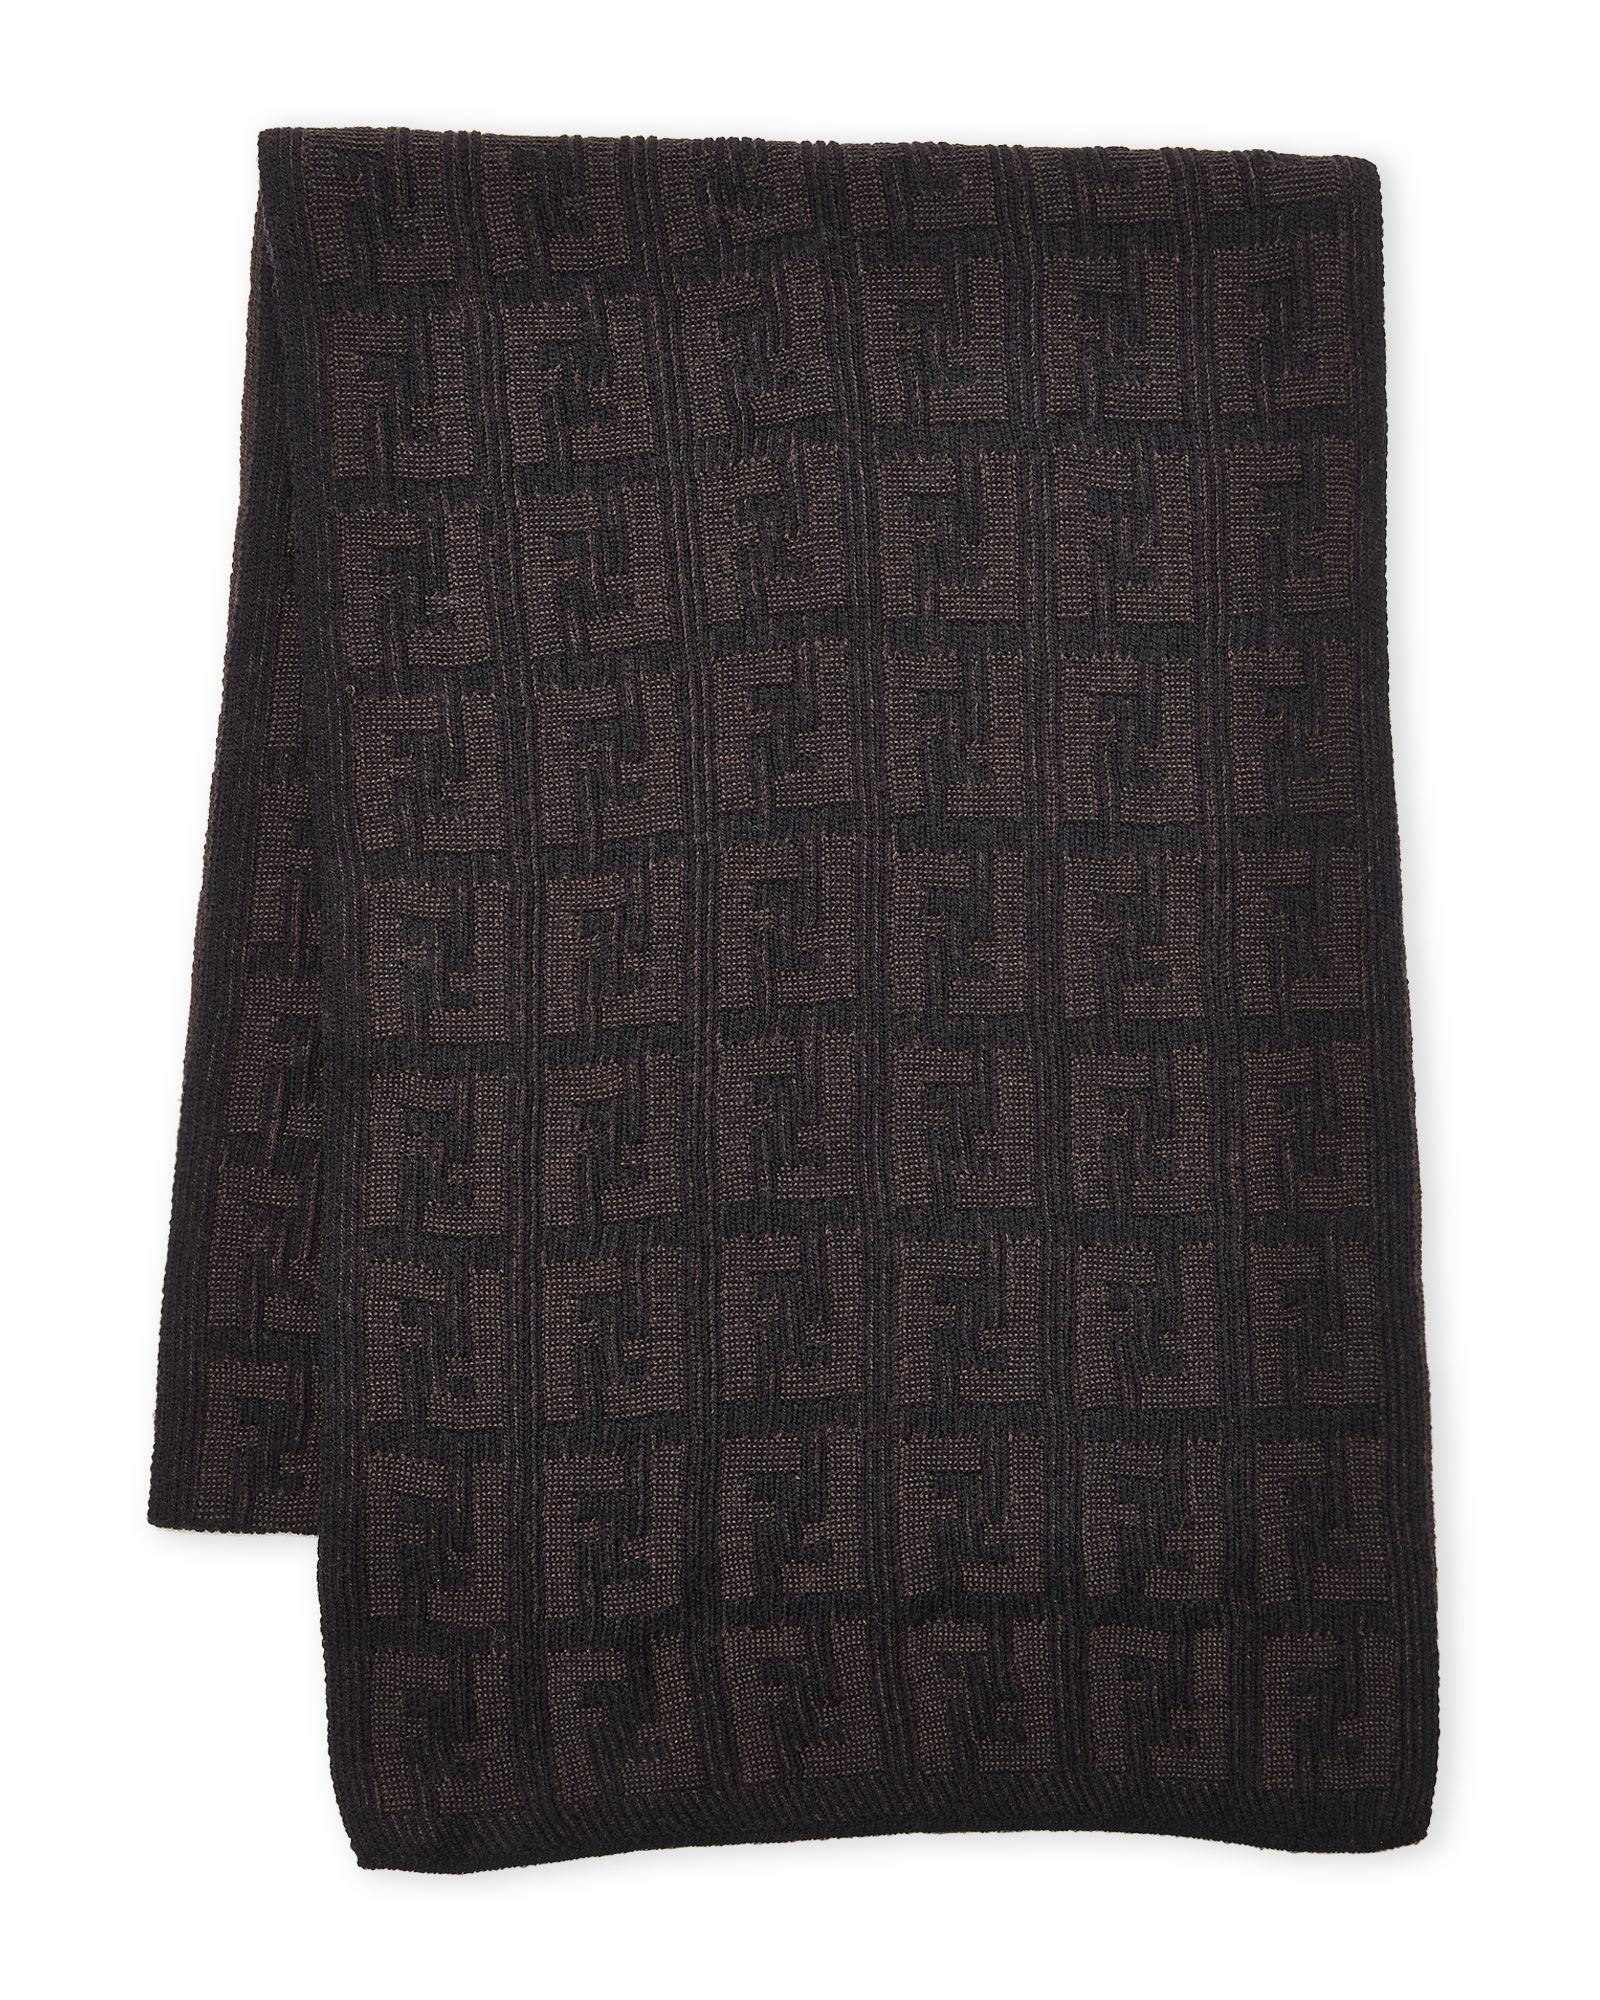 ff6533a3cdf ... where to buy lyst fendi logo wool scarf in brown for men 9482c 314af